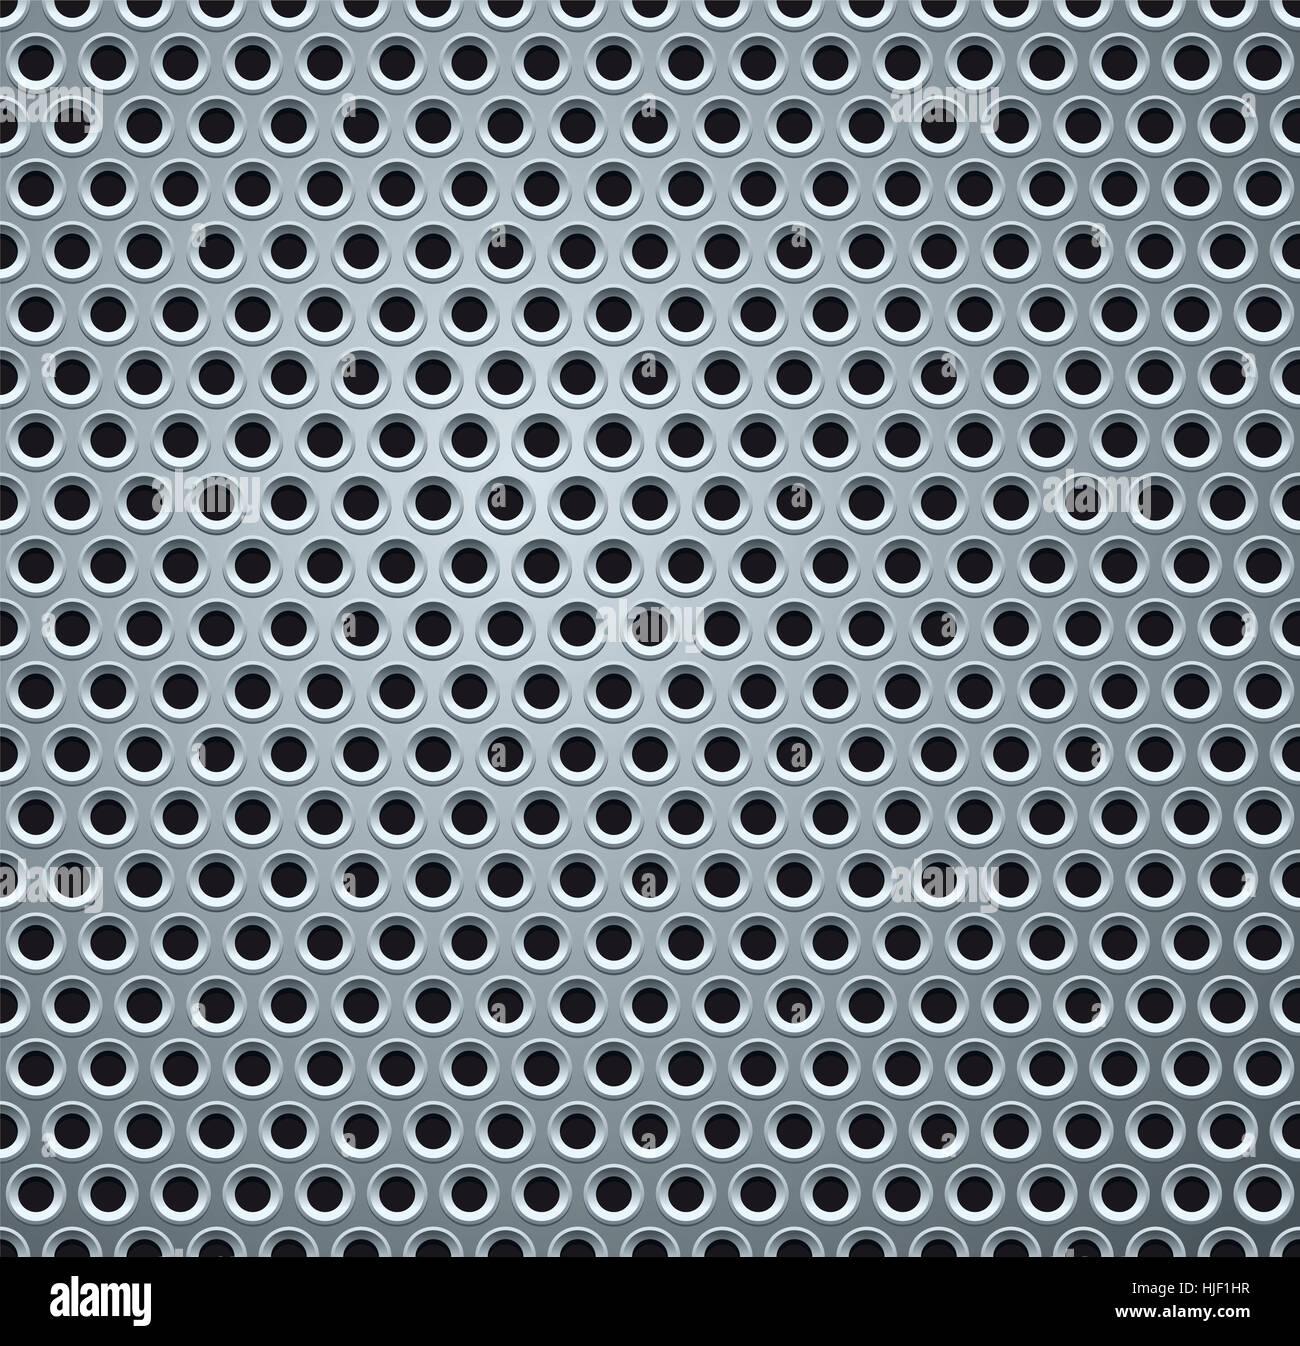 silver, metal, mesh, pattern, polished, seamless, backdrop, background, - Stock Image